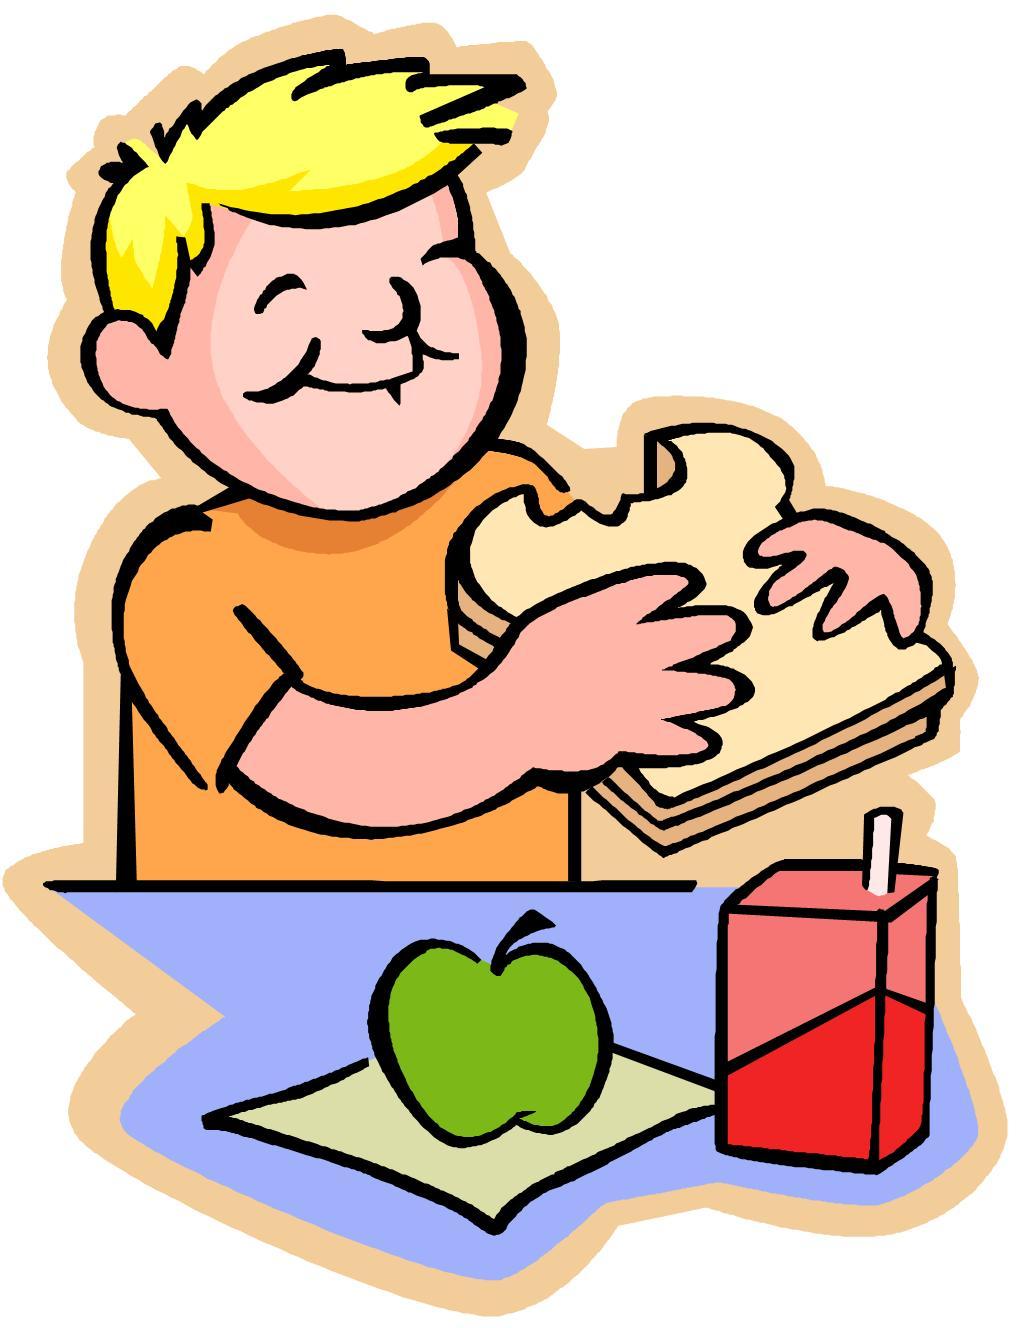 Kids eating clipart clip art free Kids Eating At Table Panda Free Images clipart free image clip art free